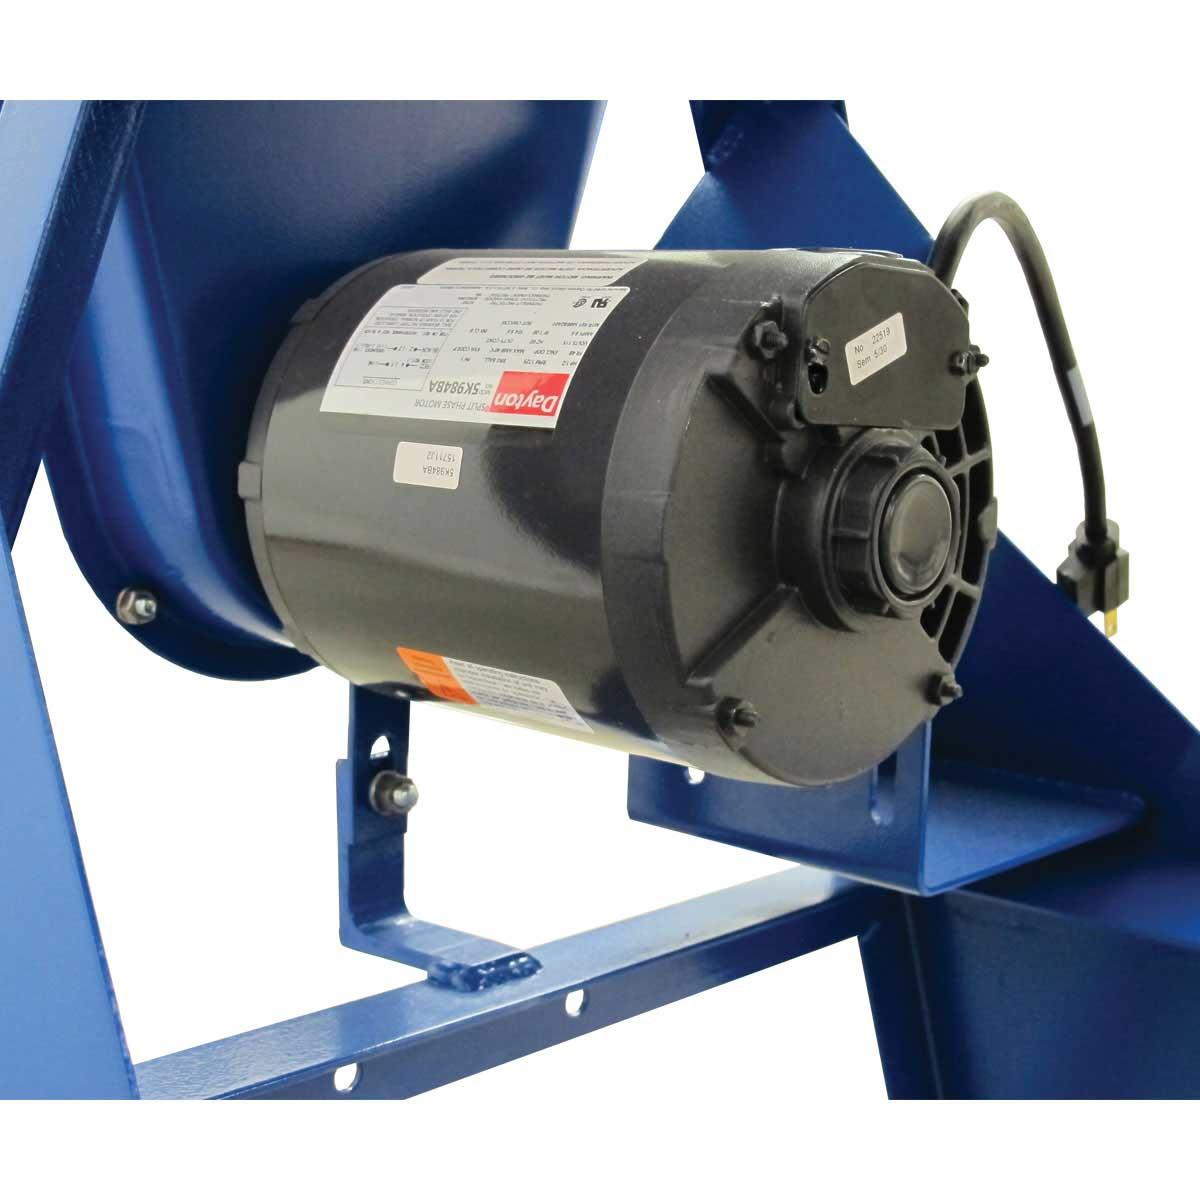 Cleform Gilson 300UT-PL motor